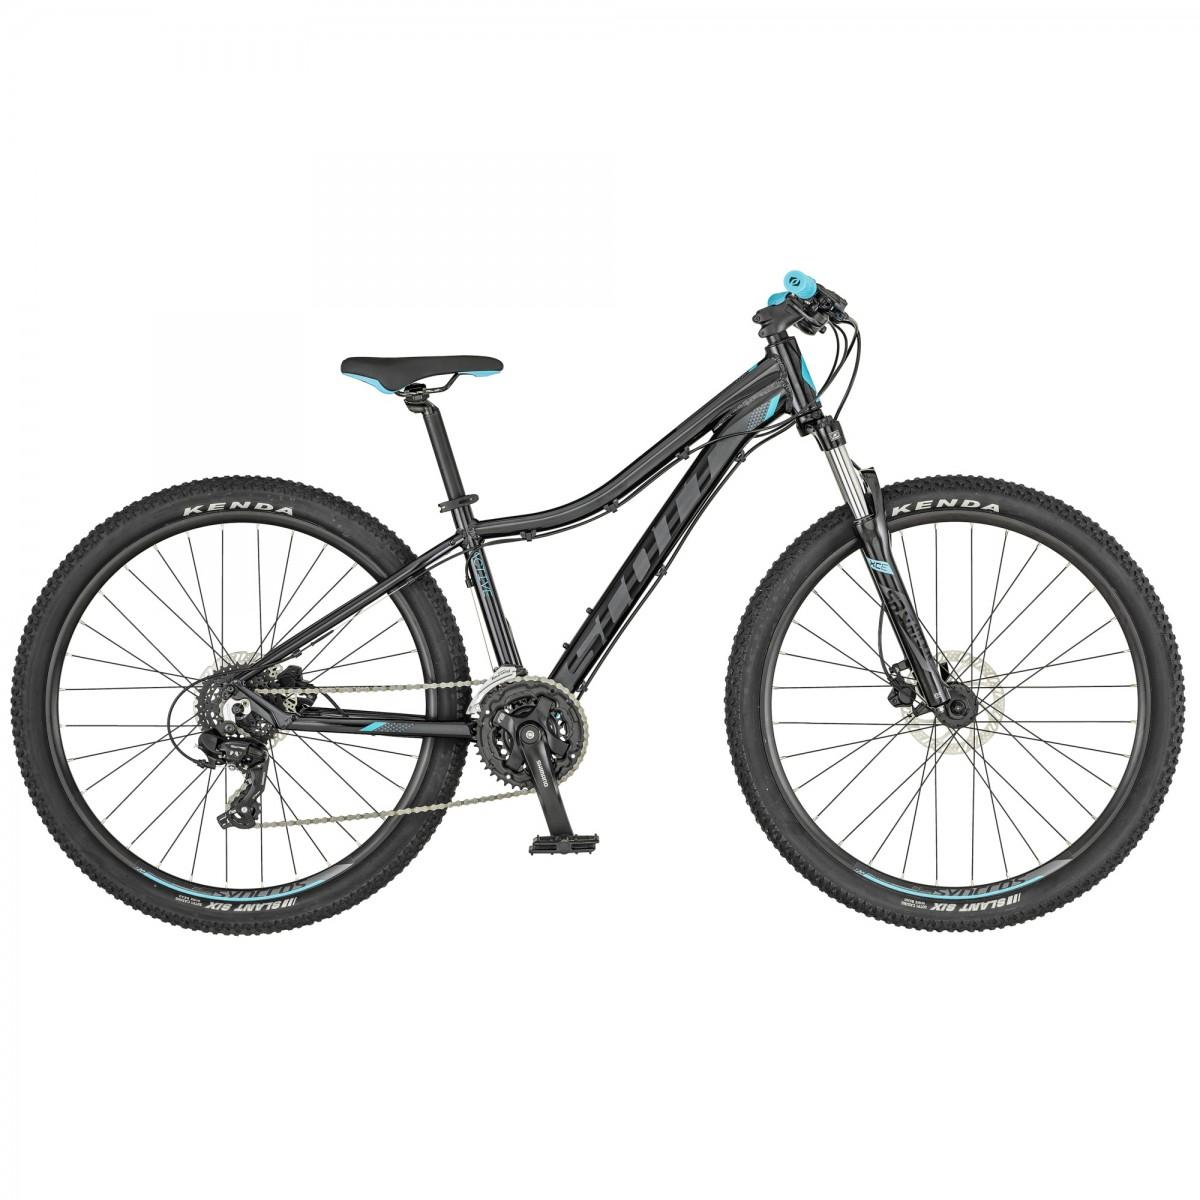 Contessa 730 Galaxyblue Bici Mtb Donna 2019